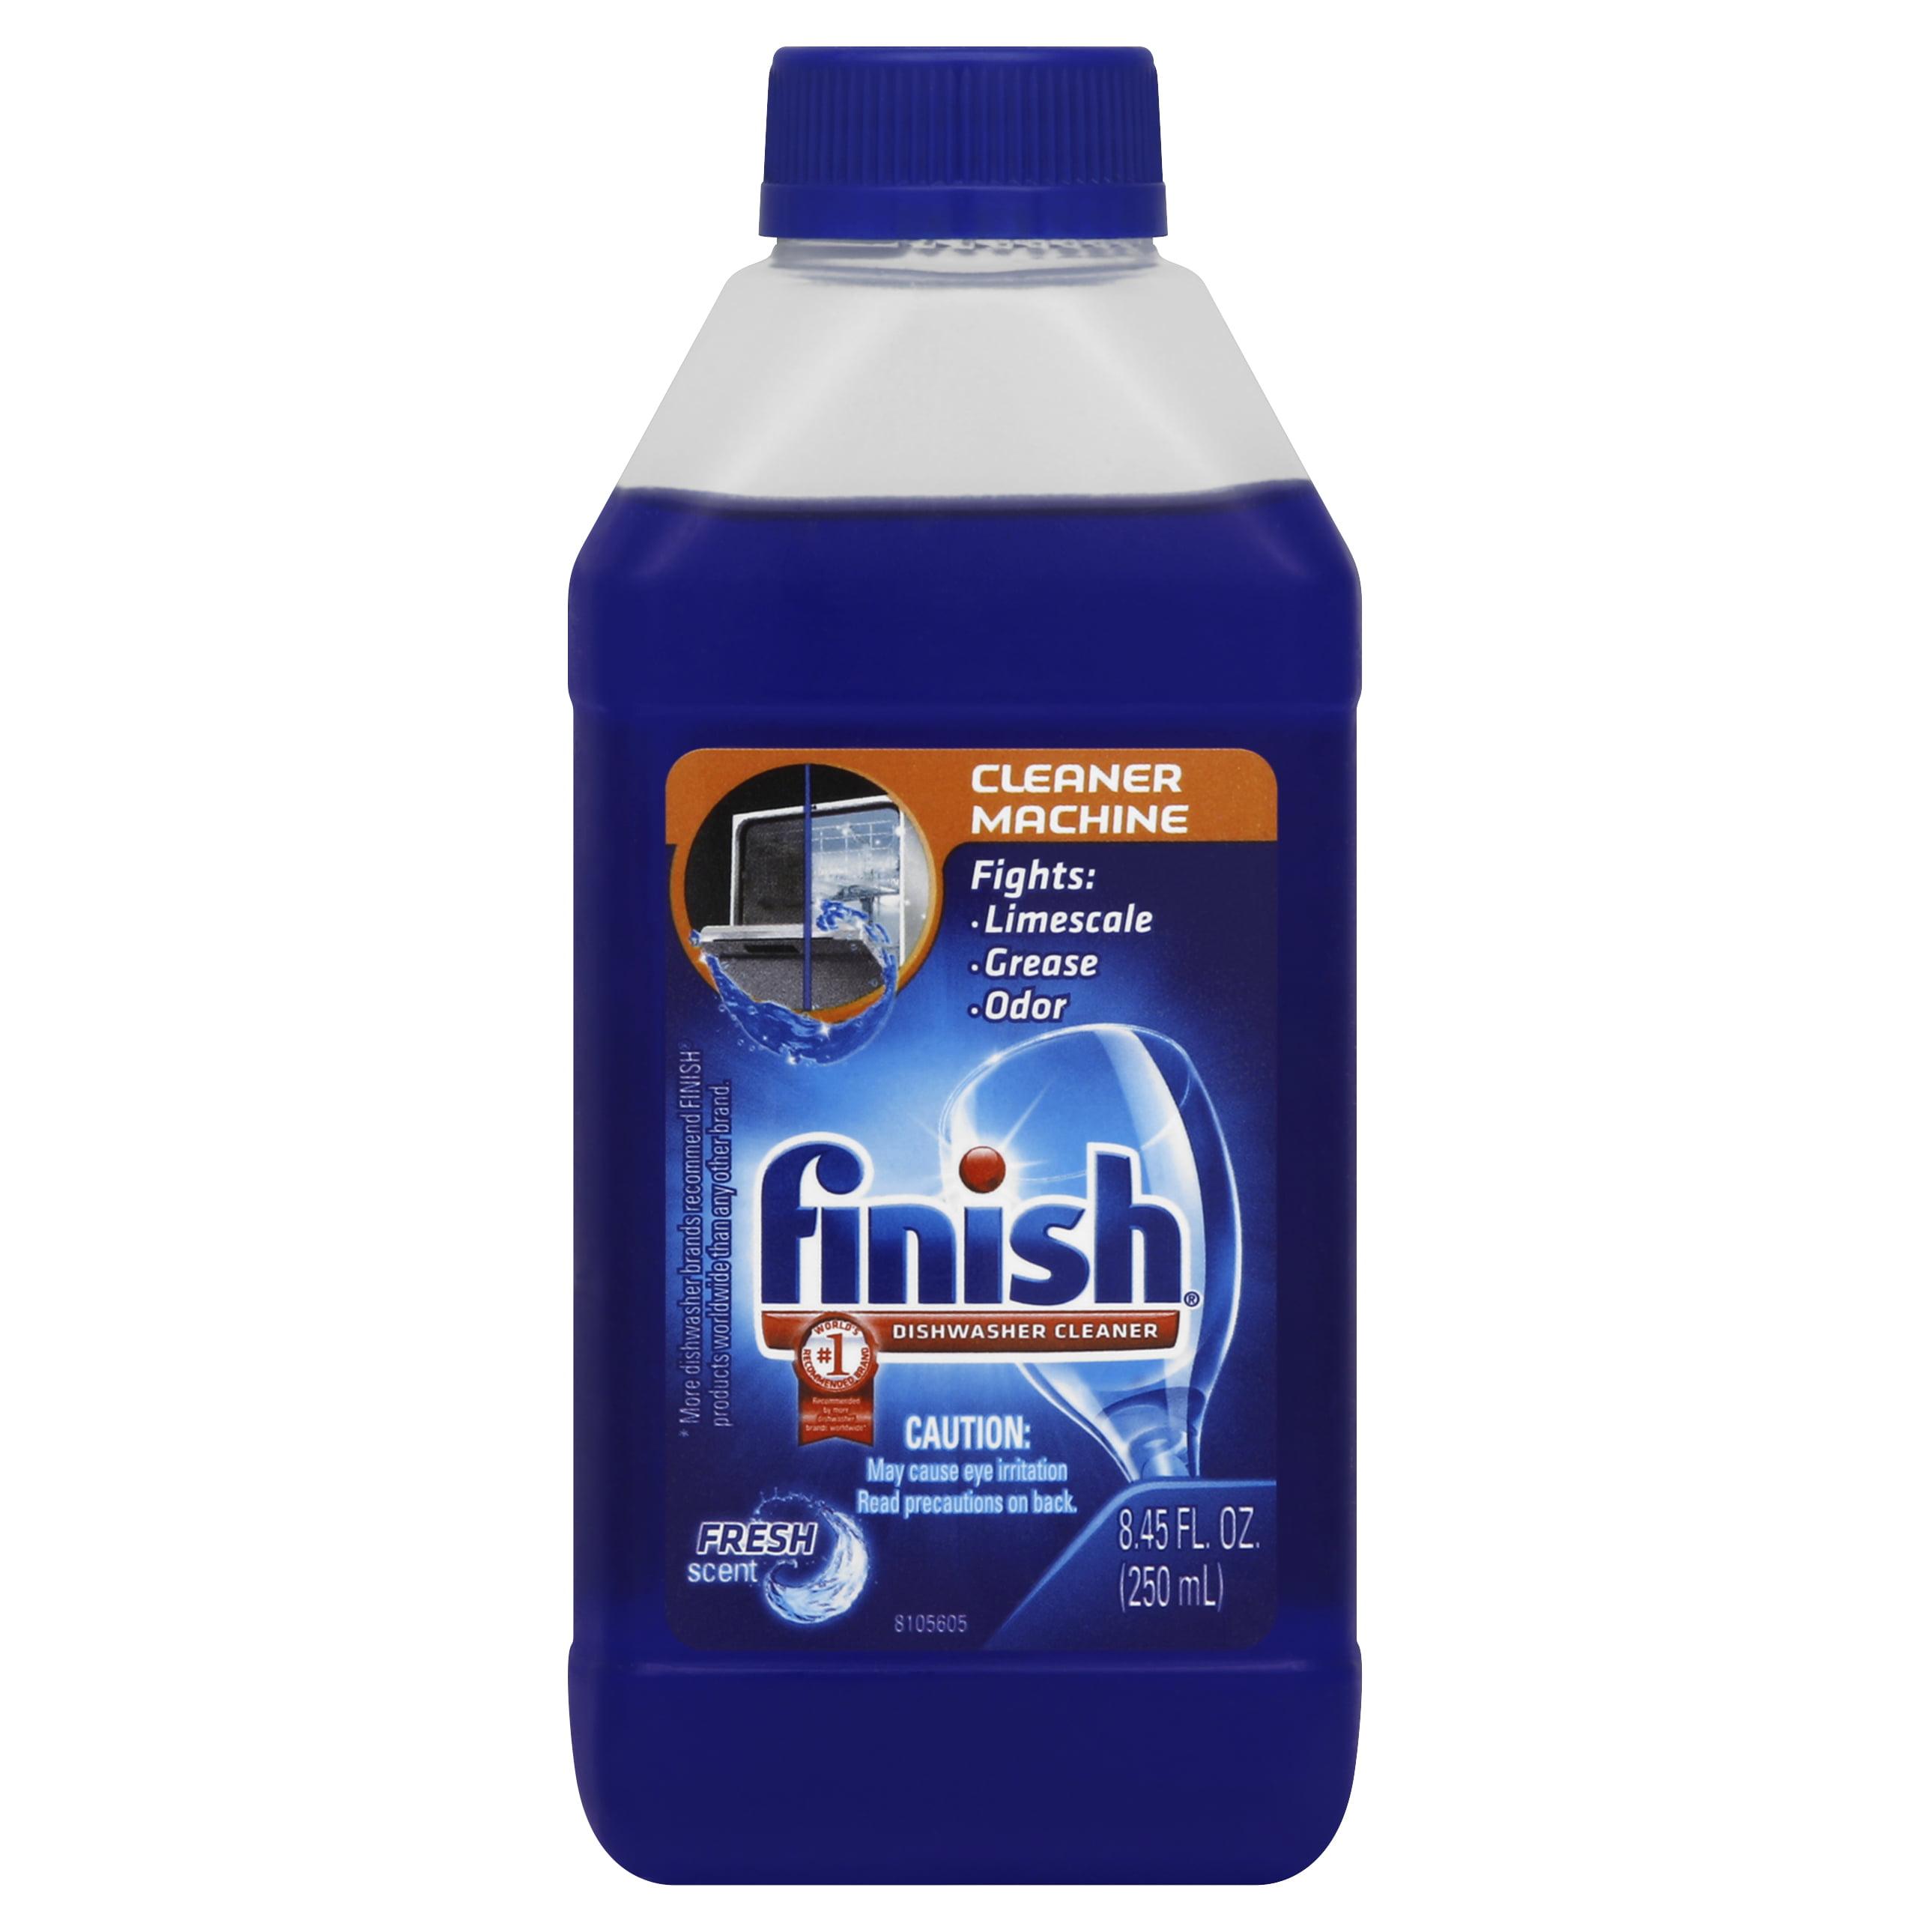 Finish Dishwasher Cleaner Solution Liquid, Liquid Fresh, 8.45 Ounces